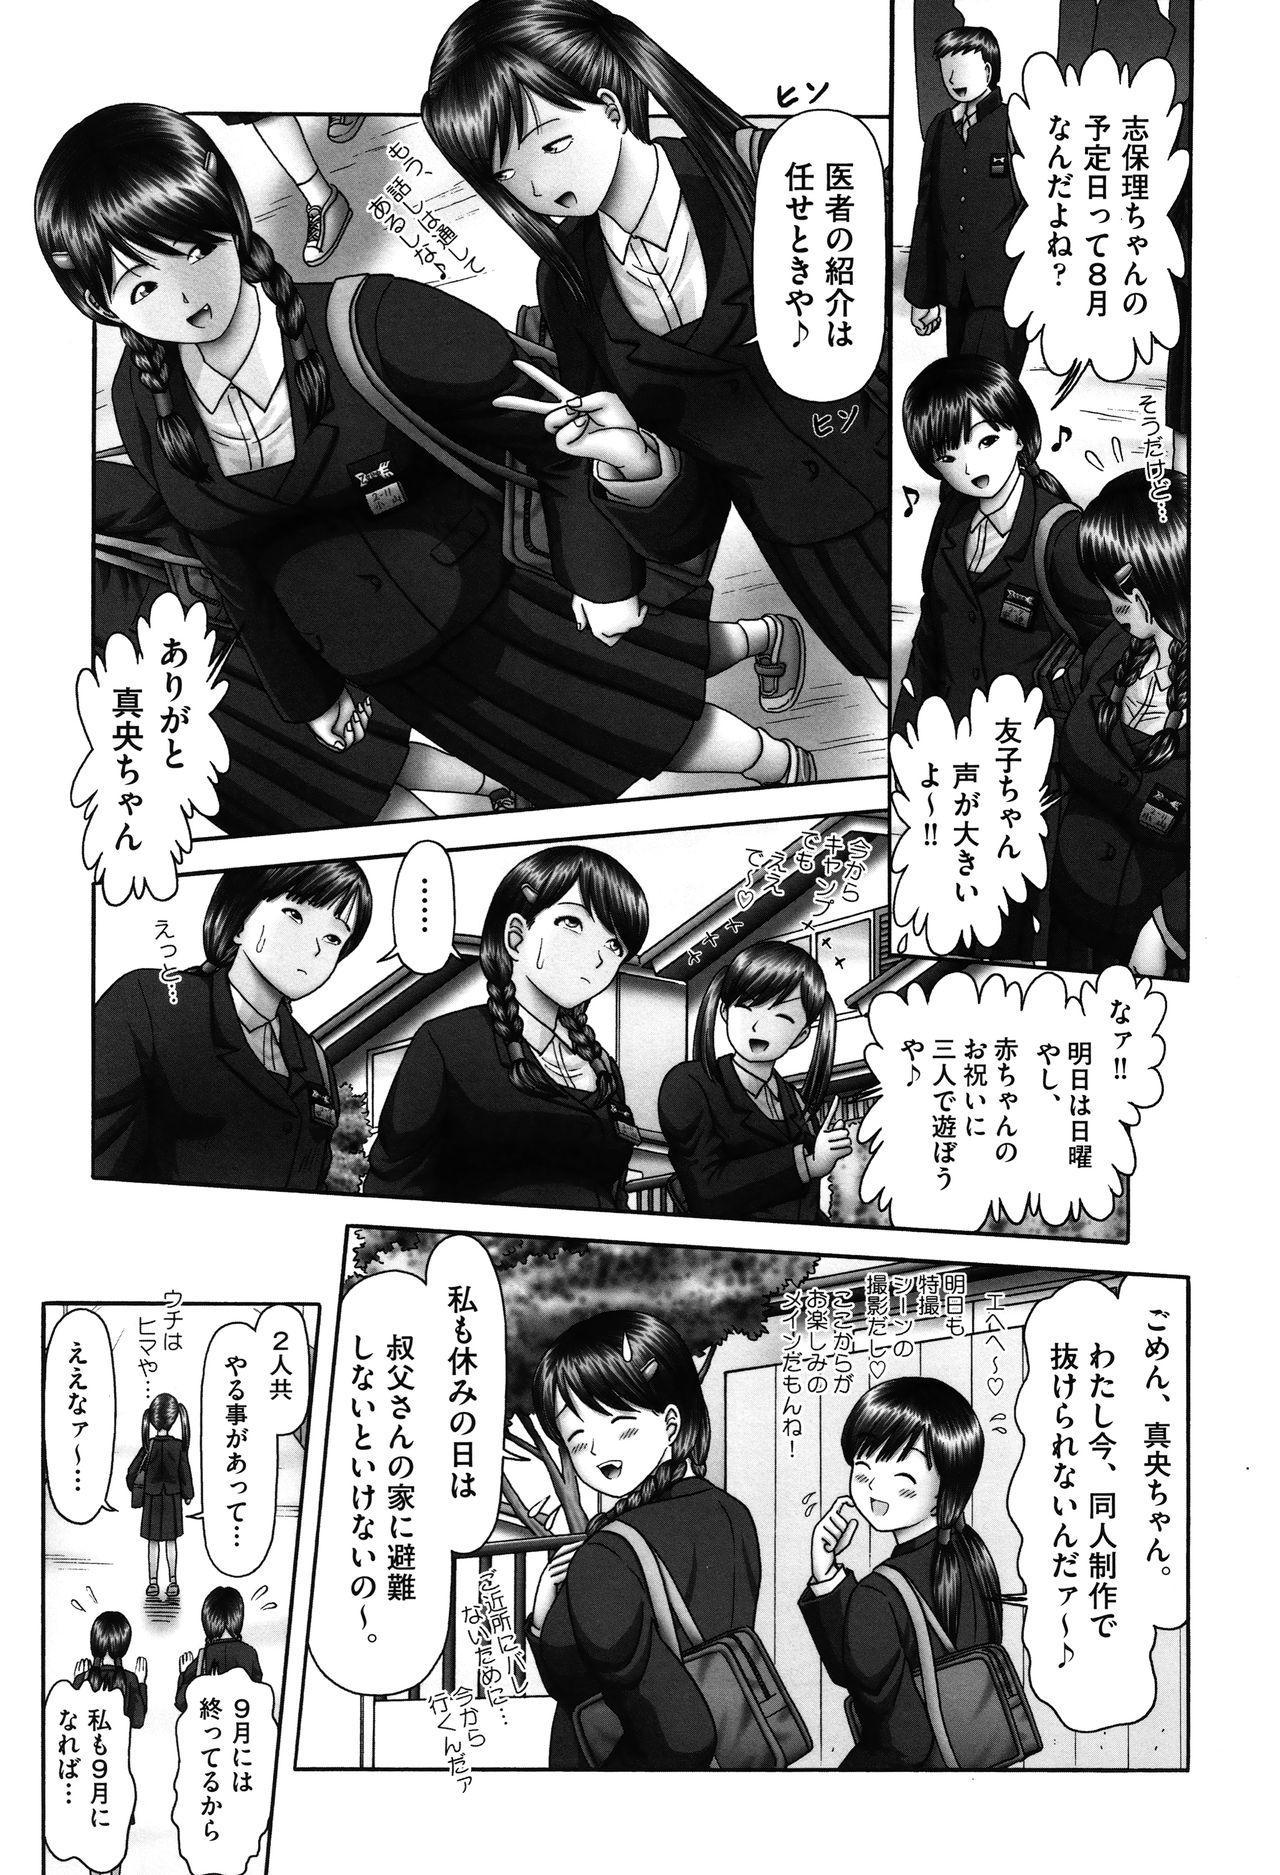 Shoujo Kumikyoku 17 21